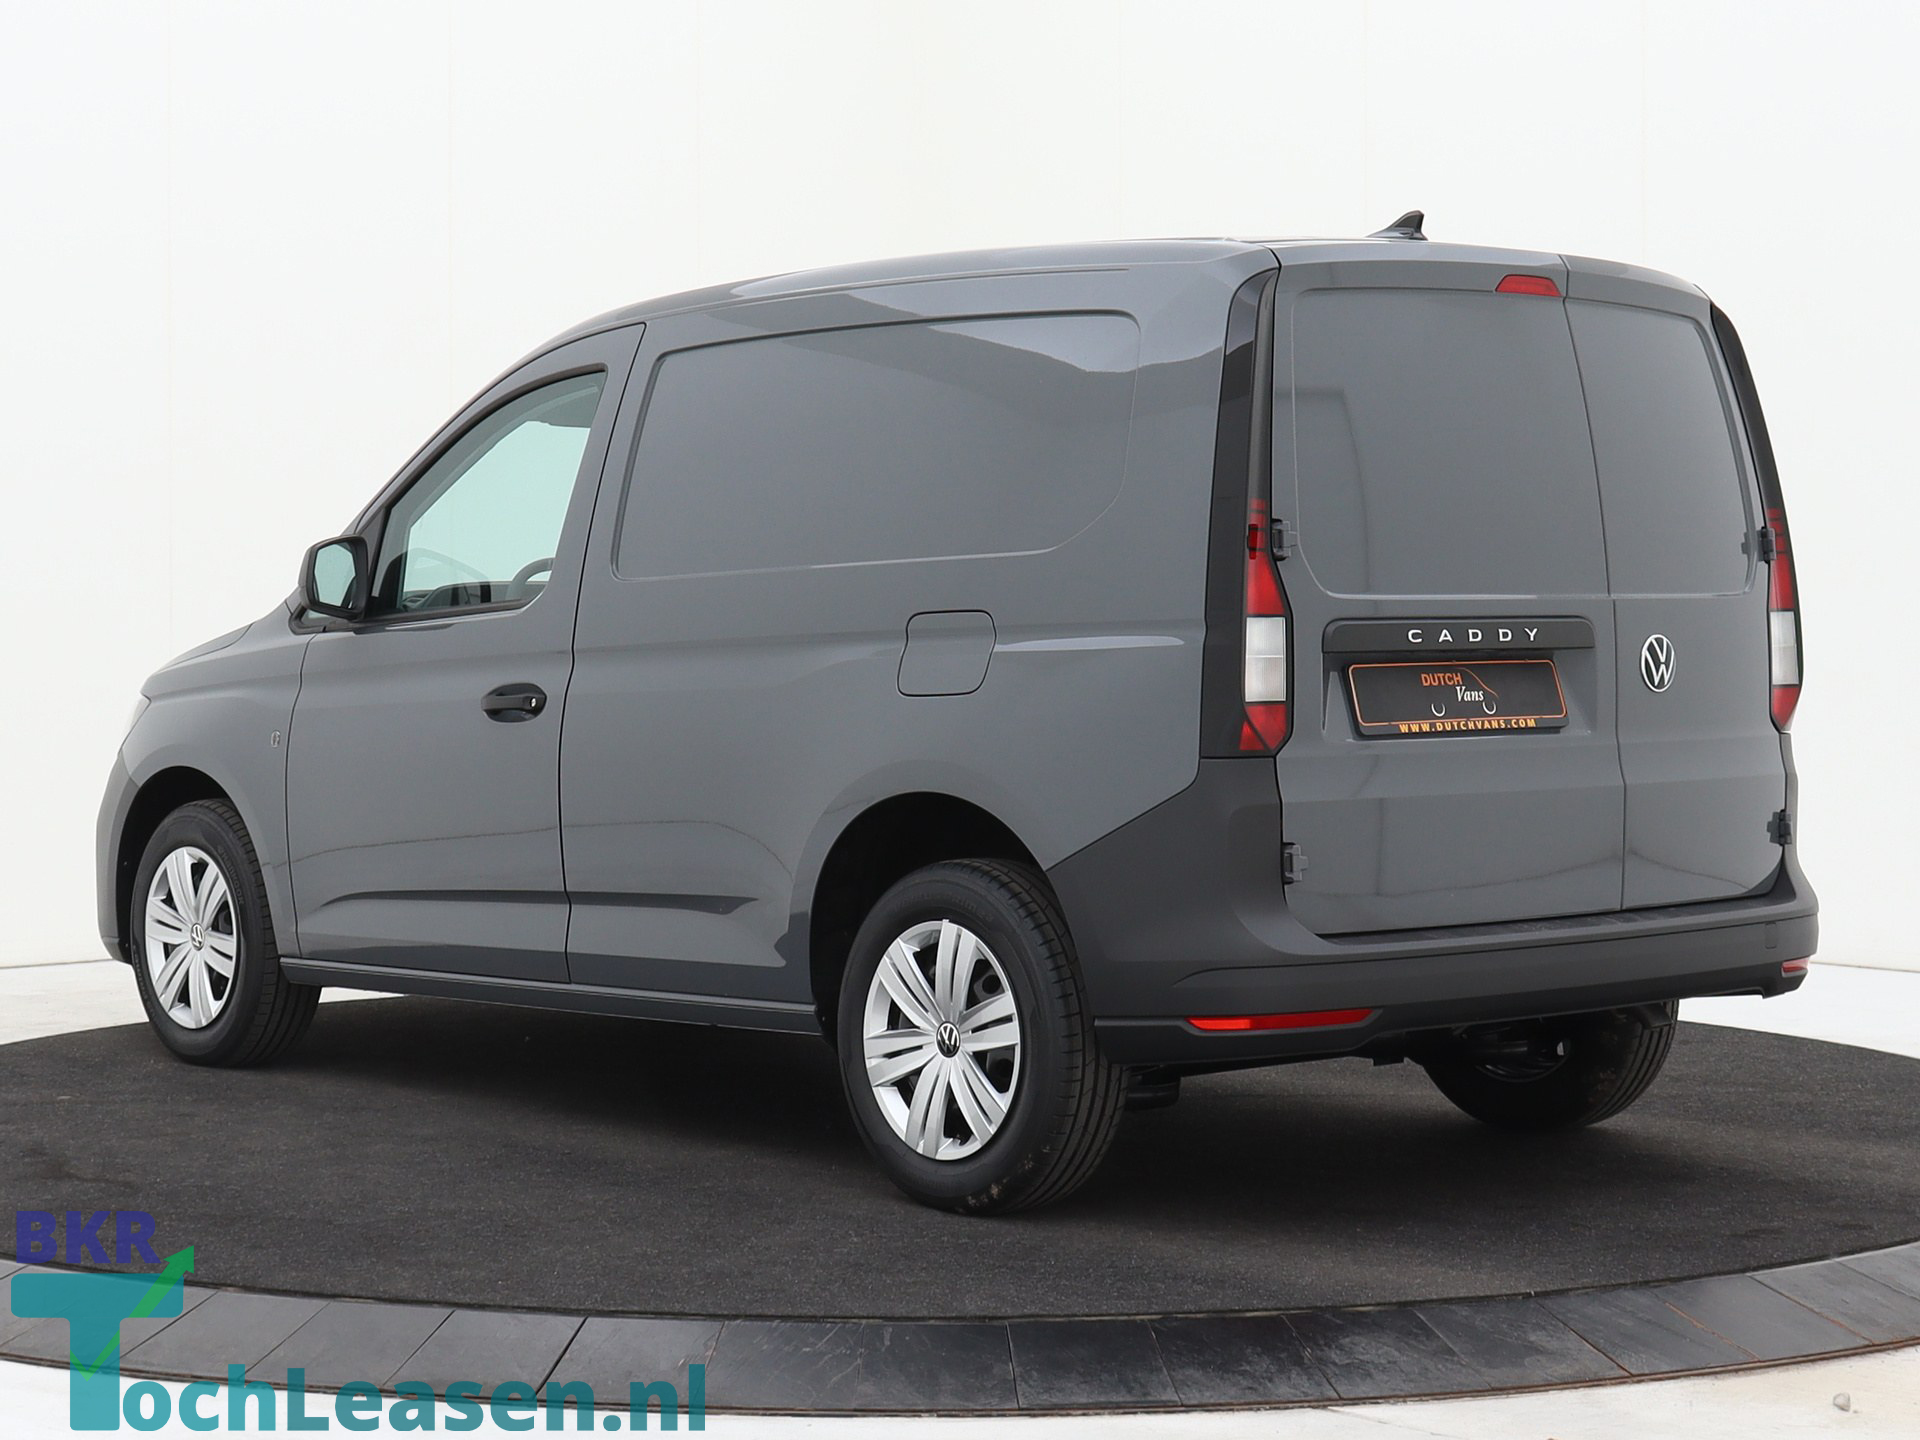 BKR toch leasen - Volkswagen Caddy - Grijs 10